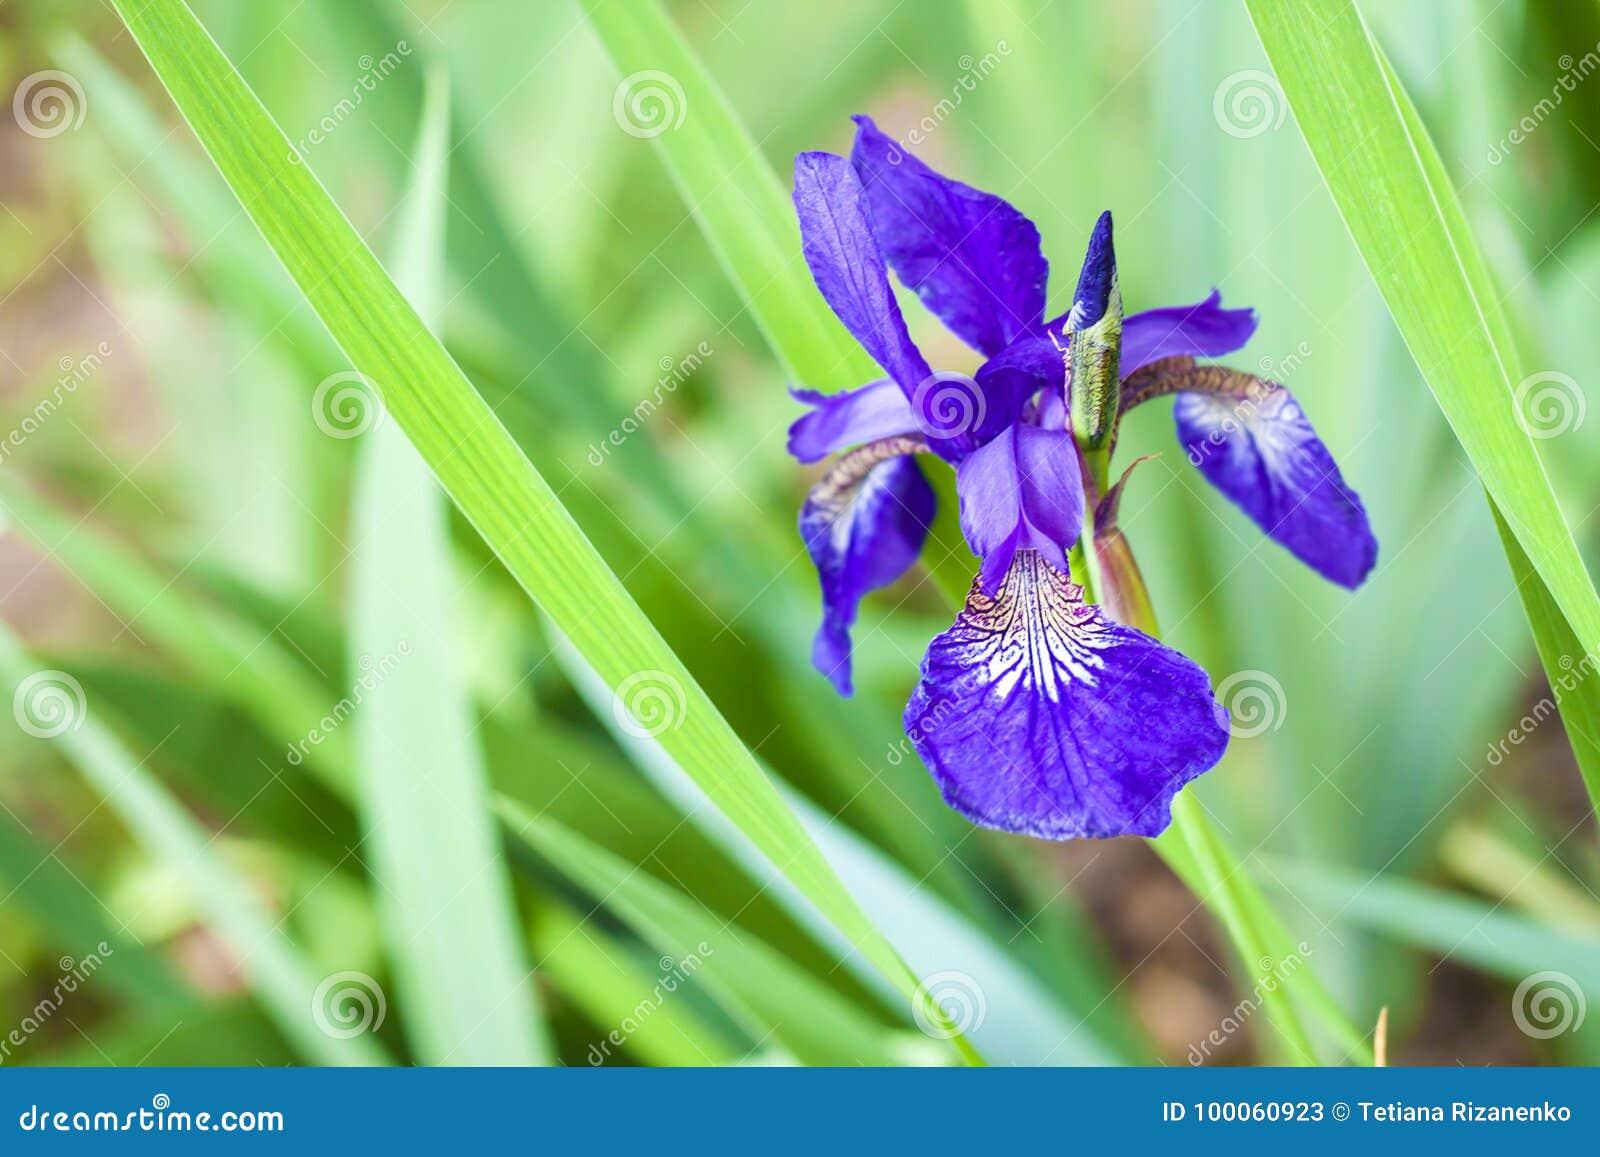 Blue siberian iris flower closeup stock image image of decorative blue siberian iris flower closeup izmirmasajfo